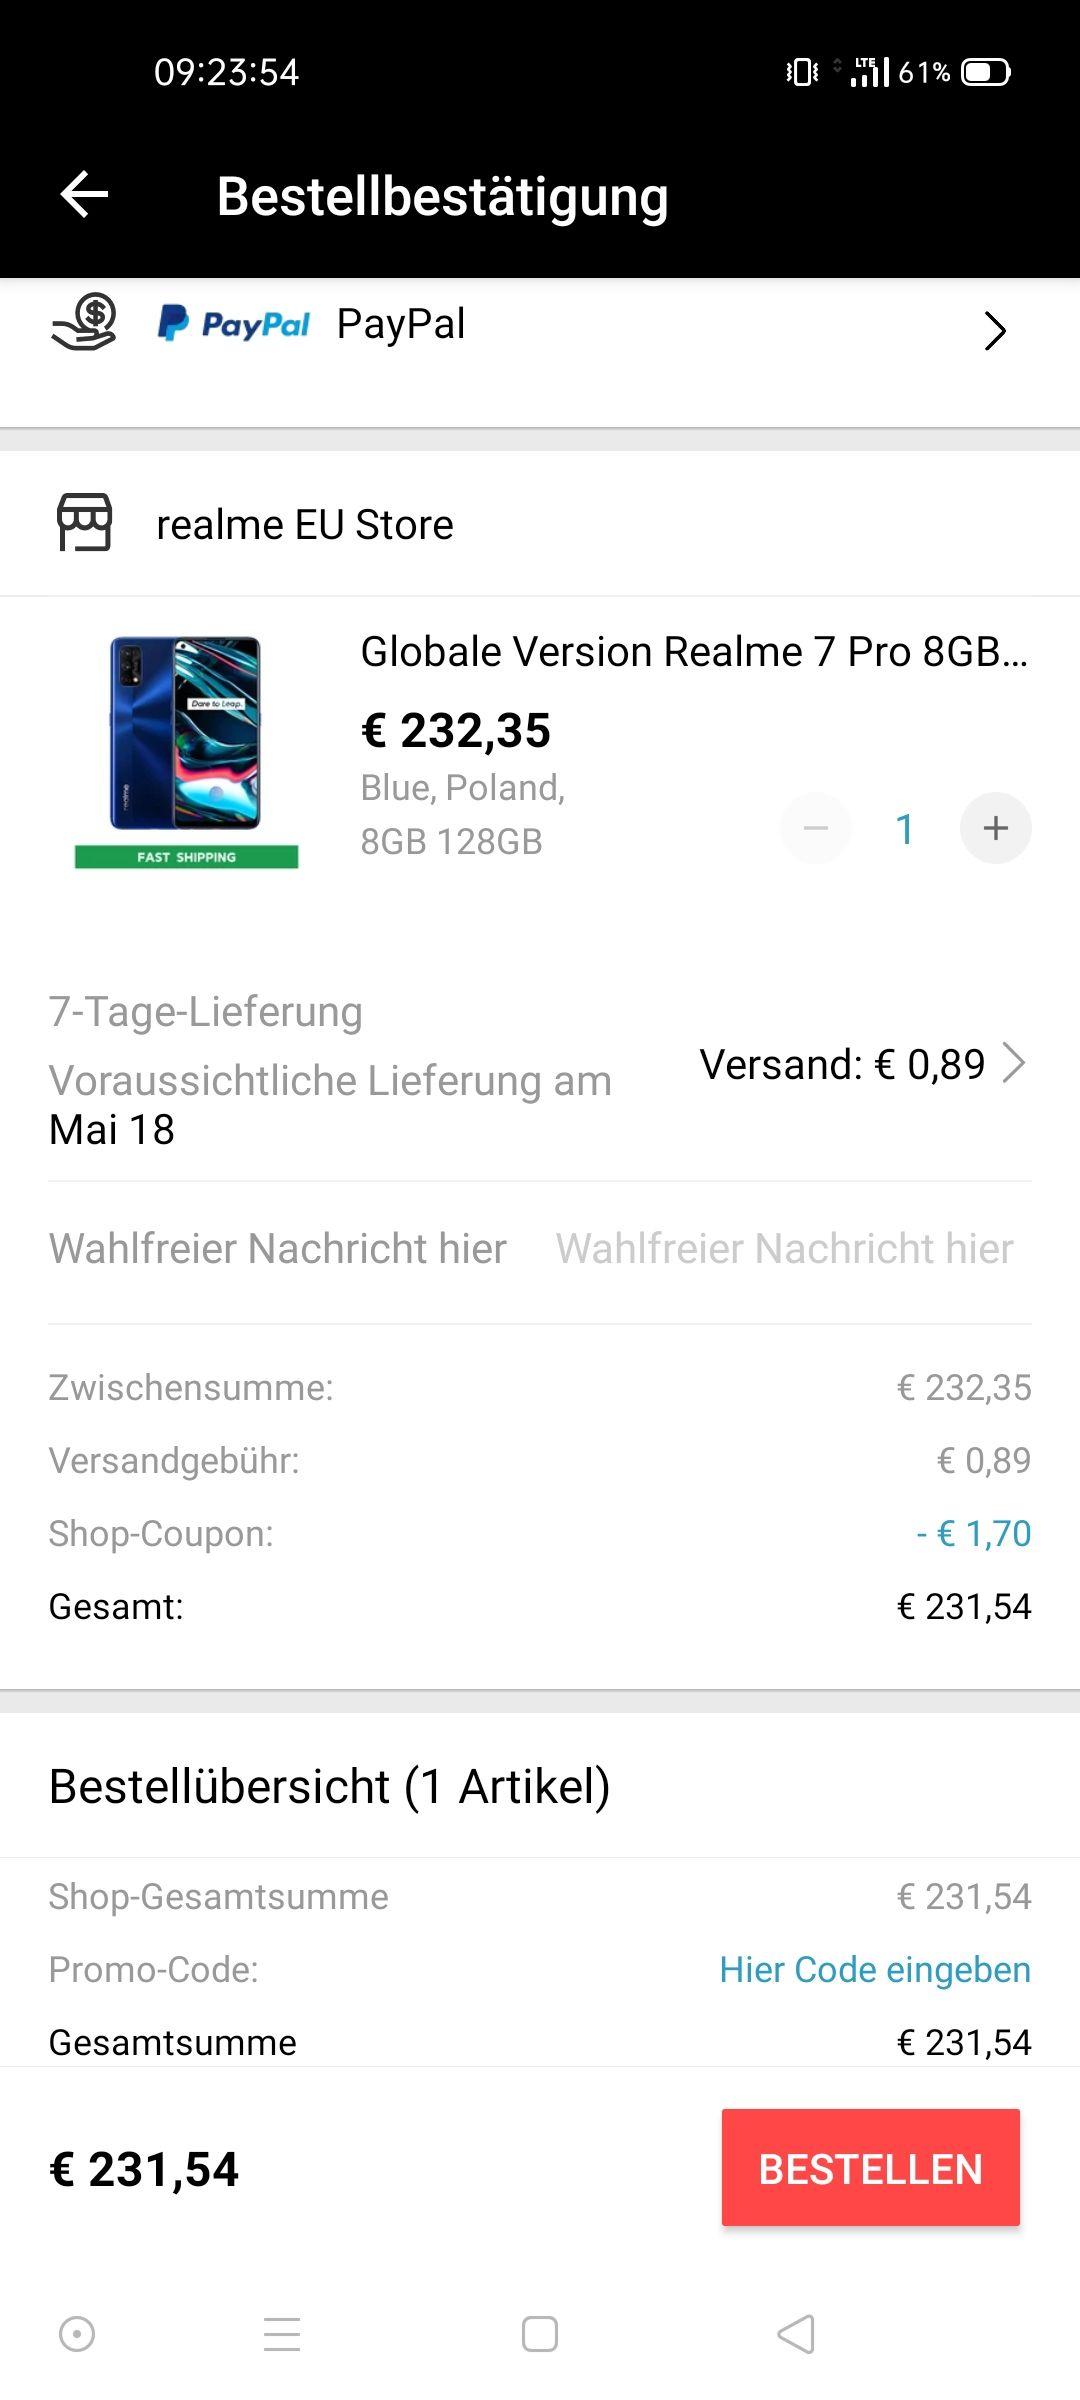 Realme 7 Pro 8/128GB, zollfrei, EU-Lager, 65W laden, AMOLED, SD720G, Stereo Lautsprecher, 64MP Sony-Sensor IMX 862